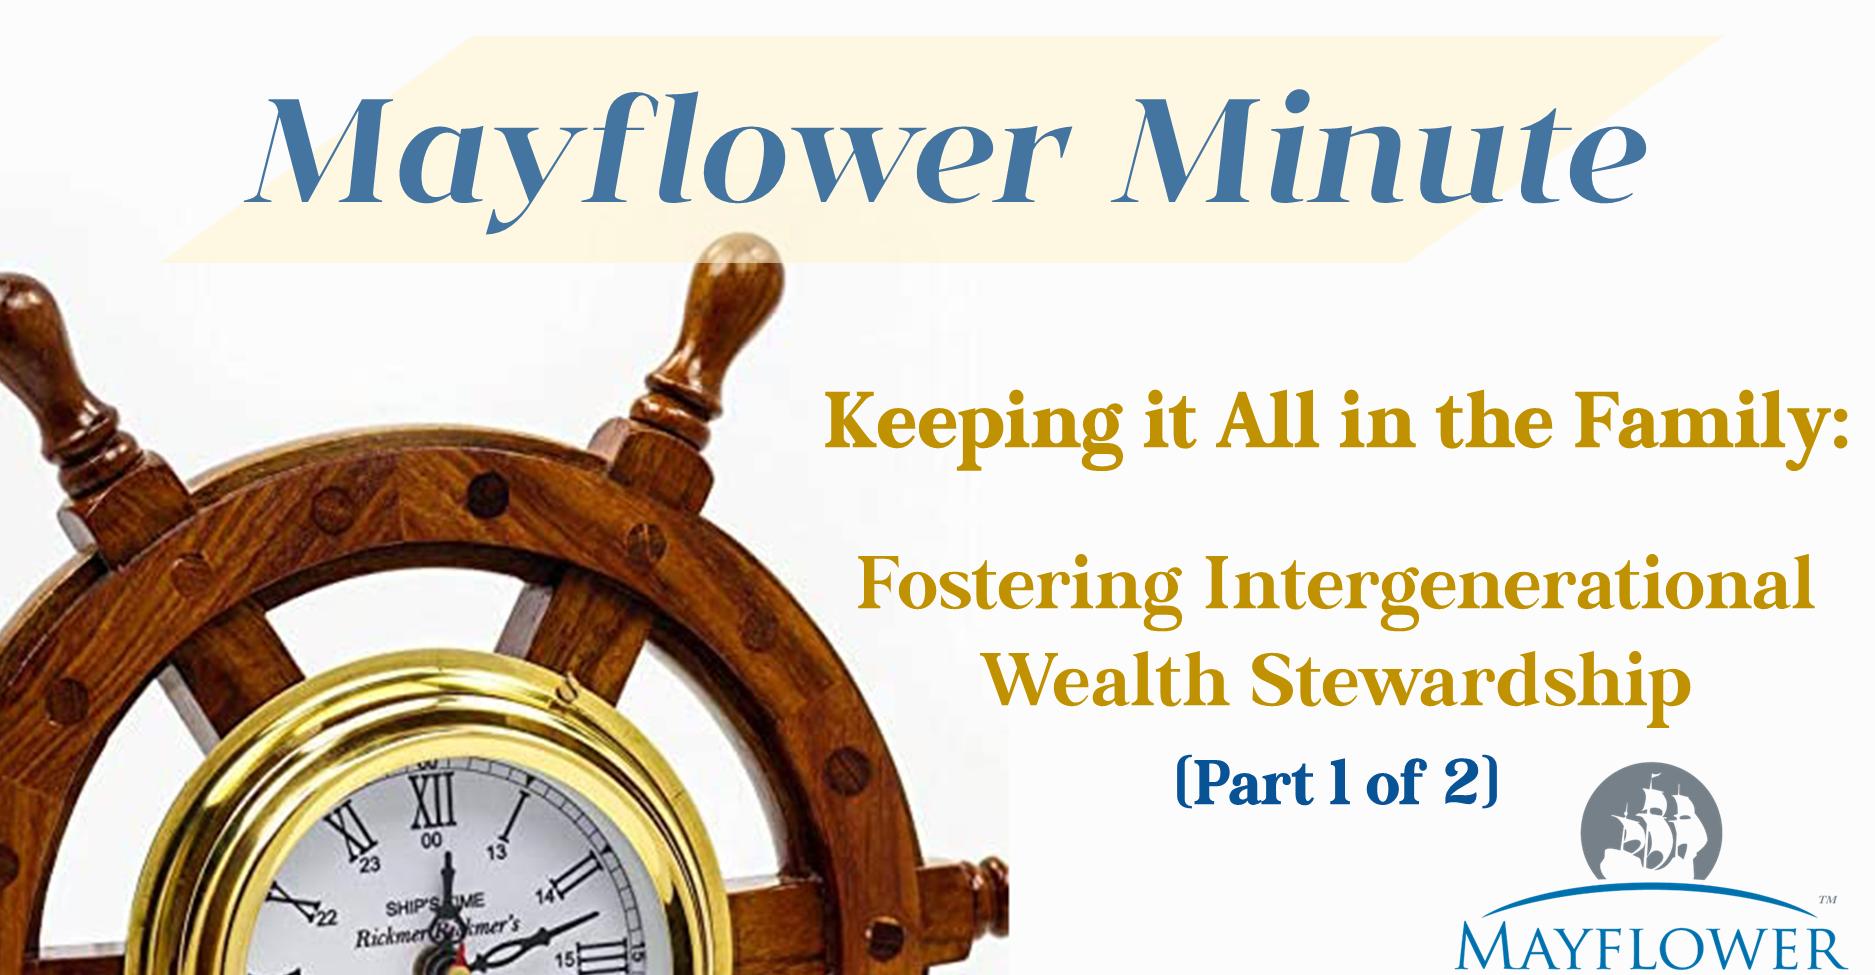 Mayflower Minute Banner-Wealth Stewardship, 1 of 2